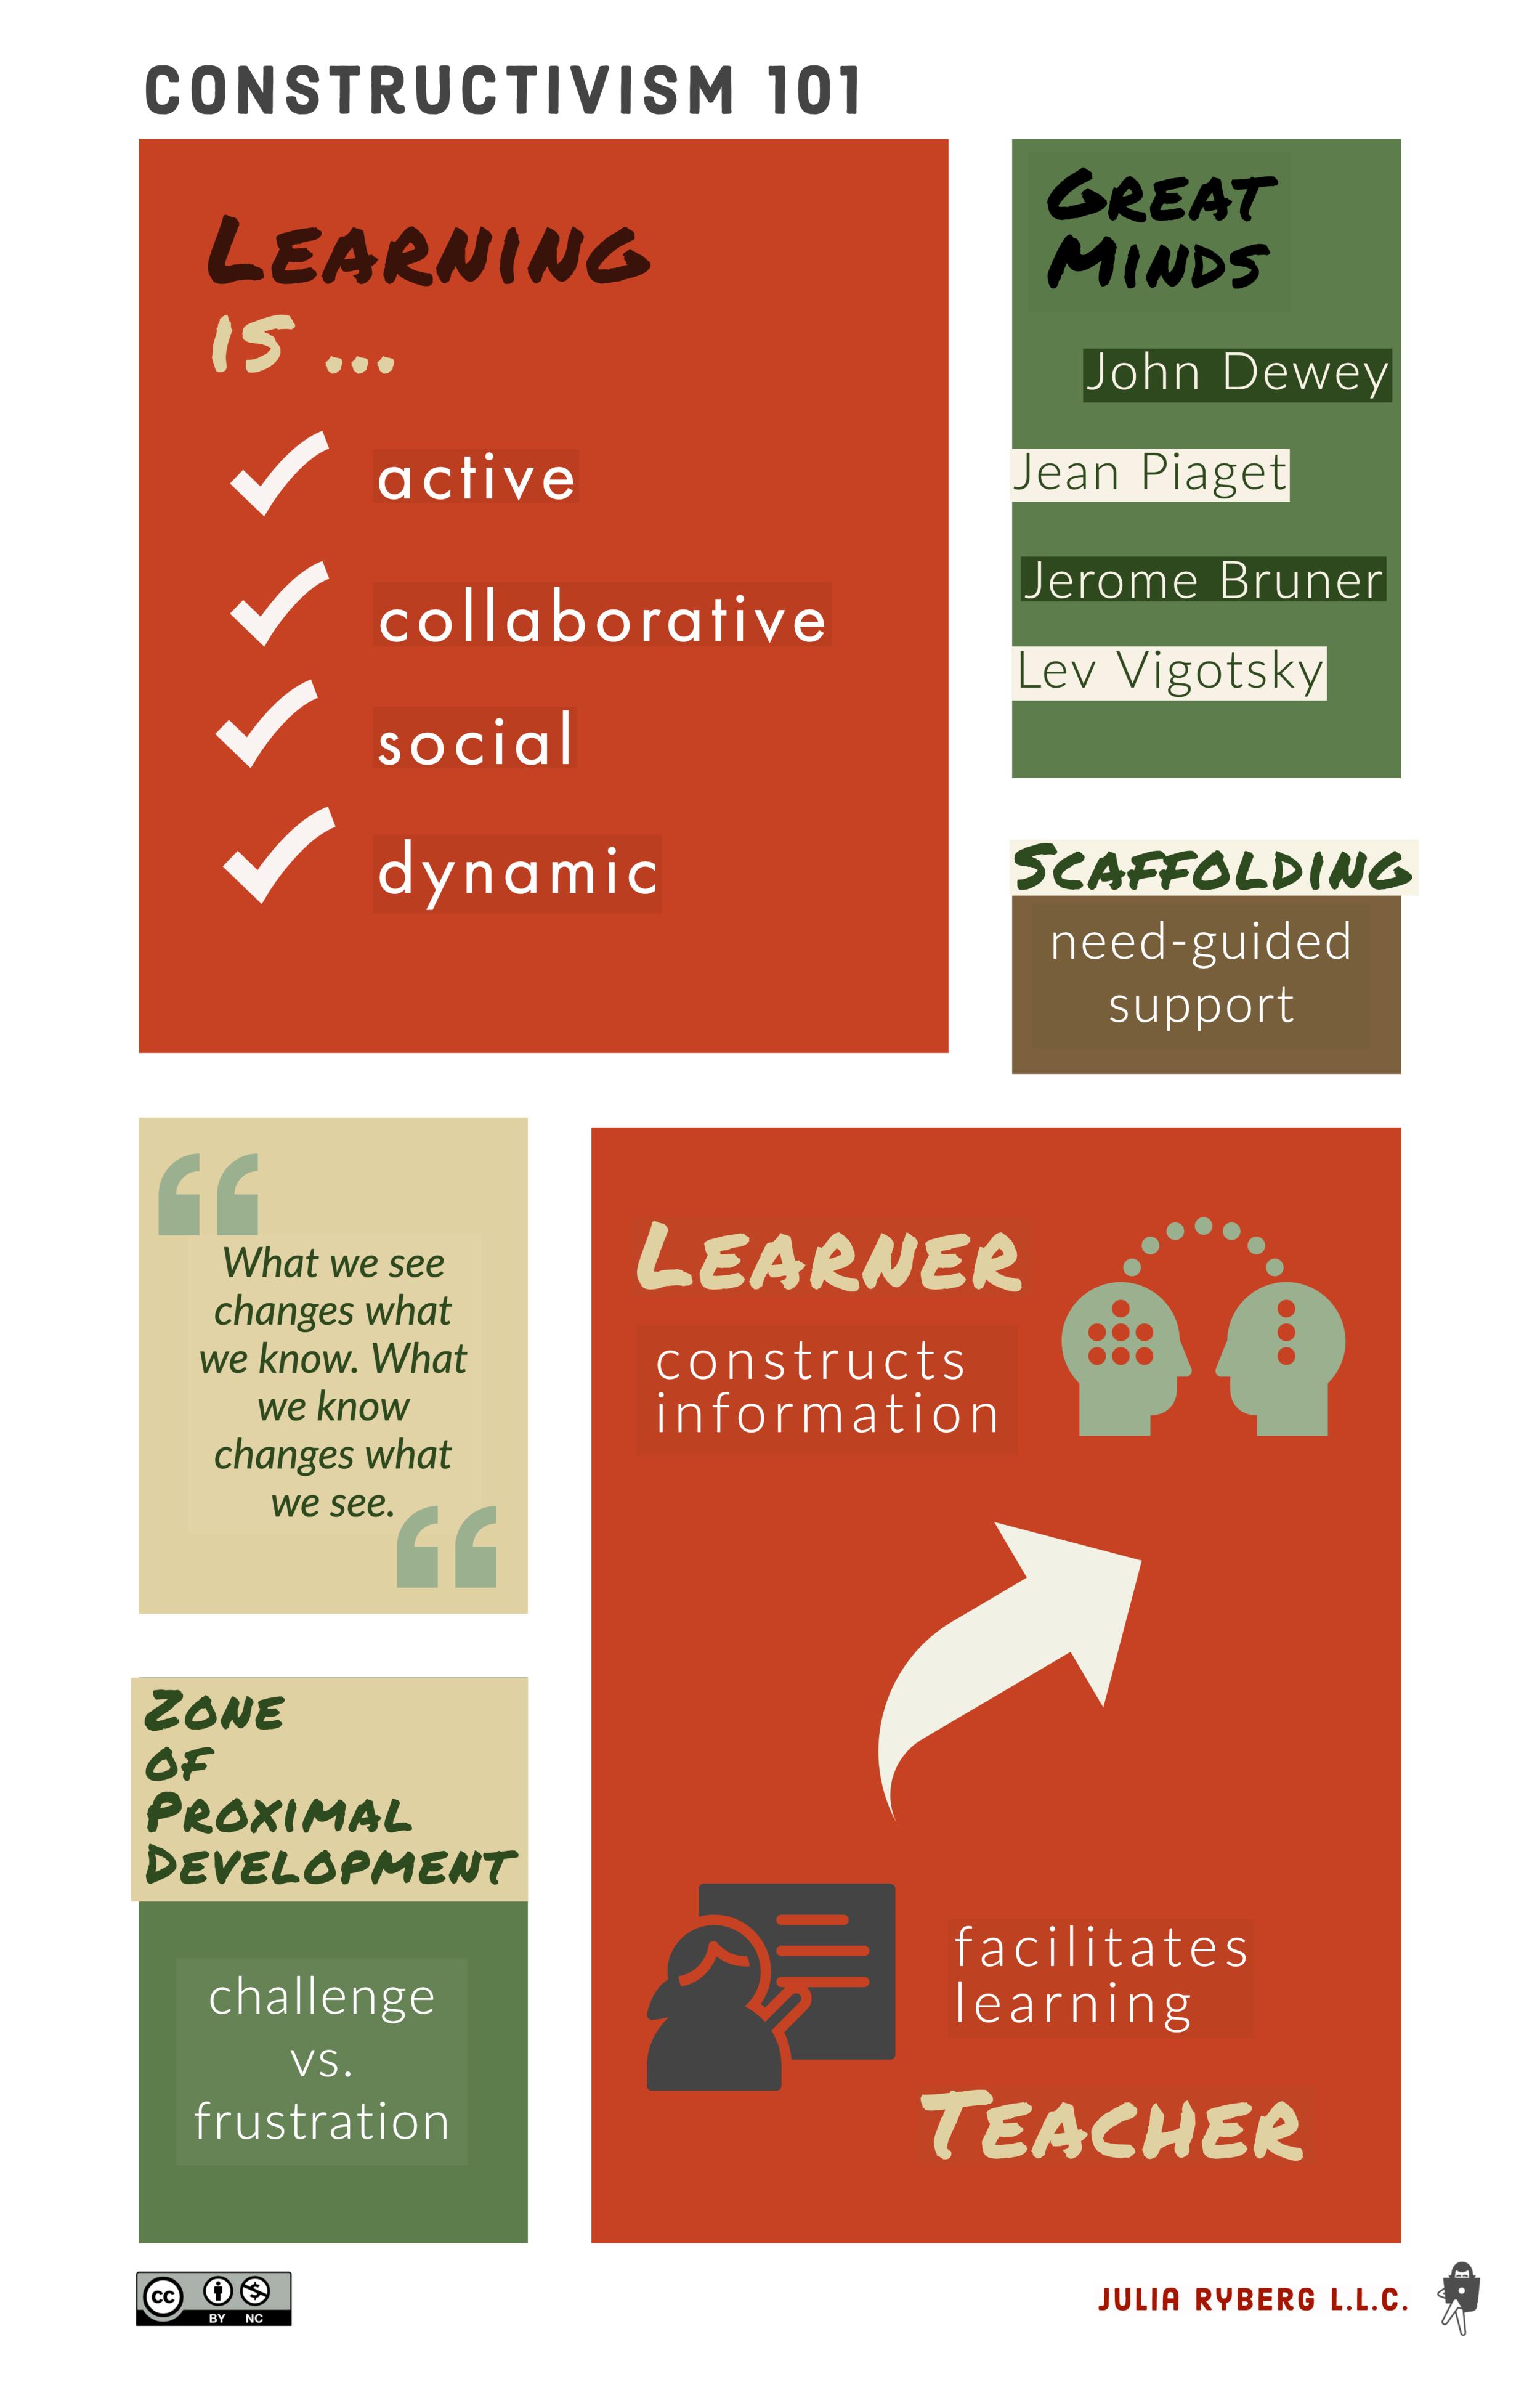 Constructivism 101 - An overview of constructivism and its implications